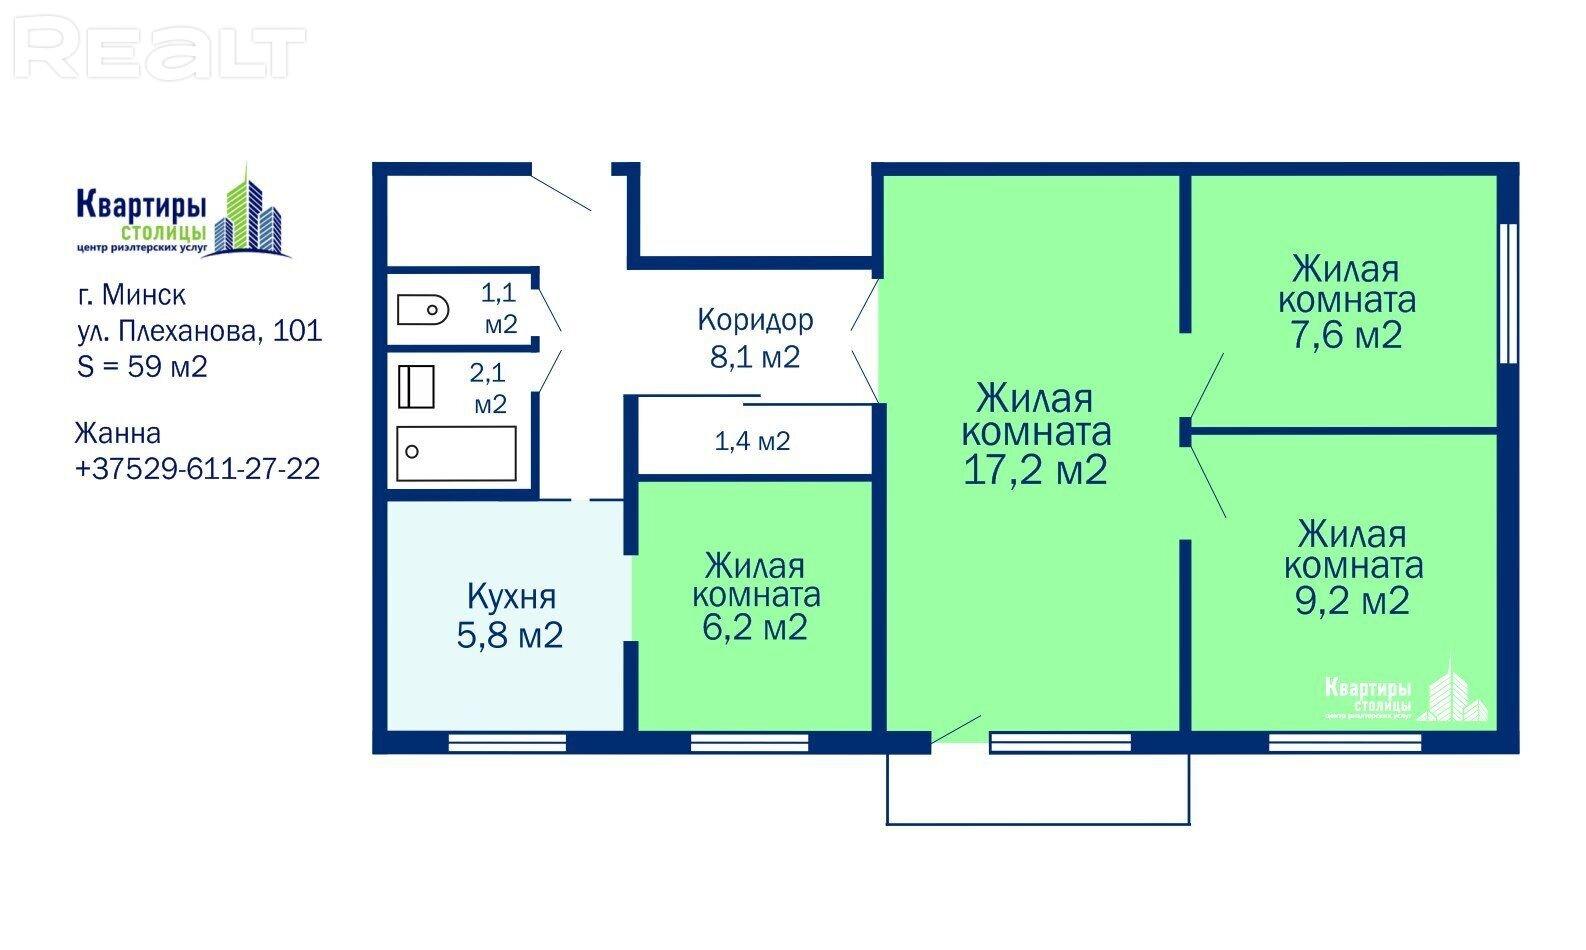 Продажа 4-х комнатной квартиры в г. Минске, ул. Плеханова, дом 101 (р-н Серебрянка). Цена 153 200 руб